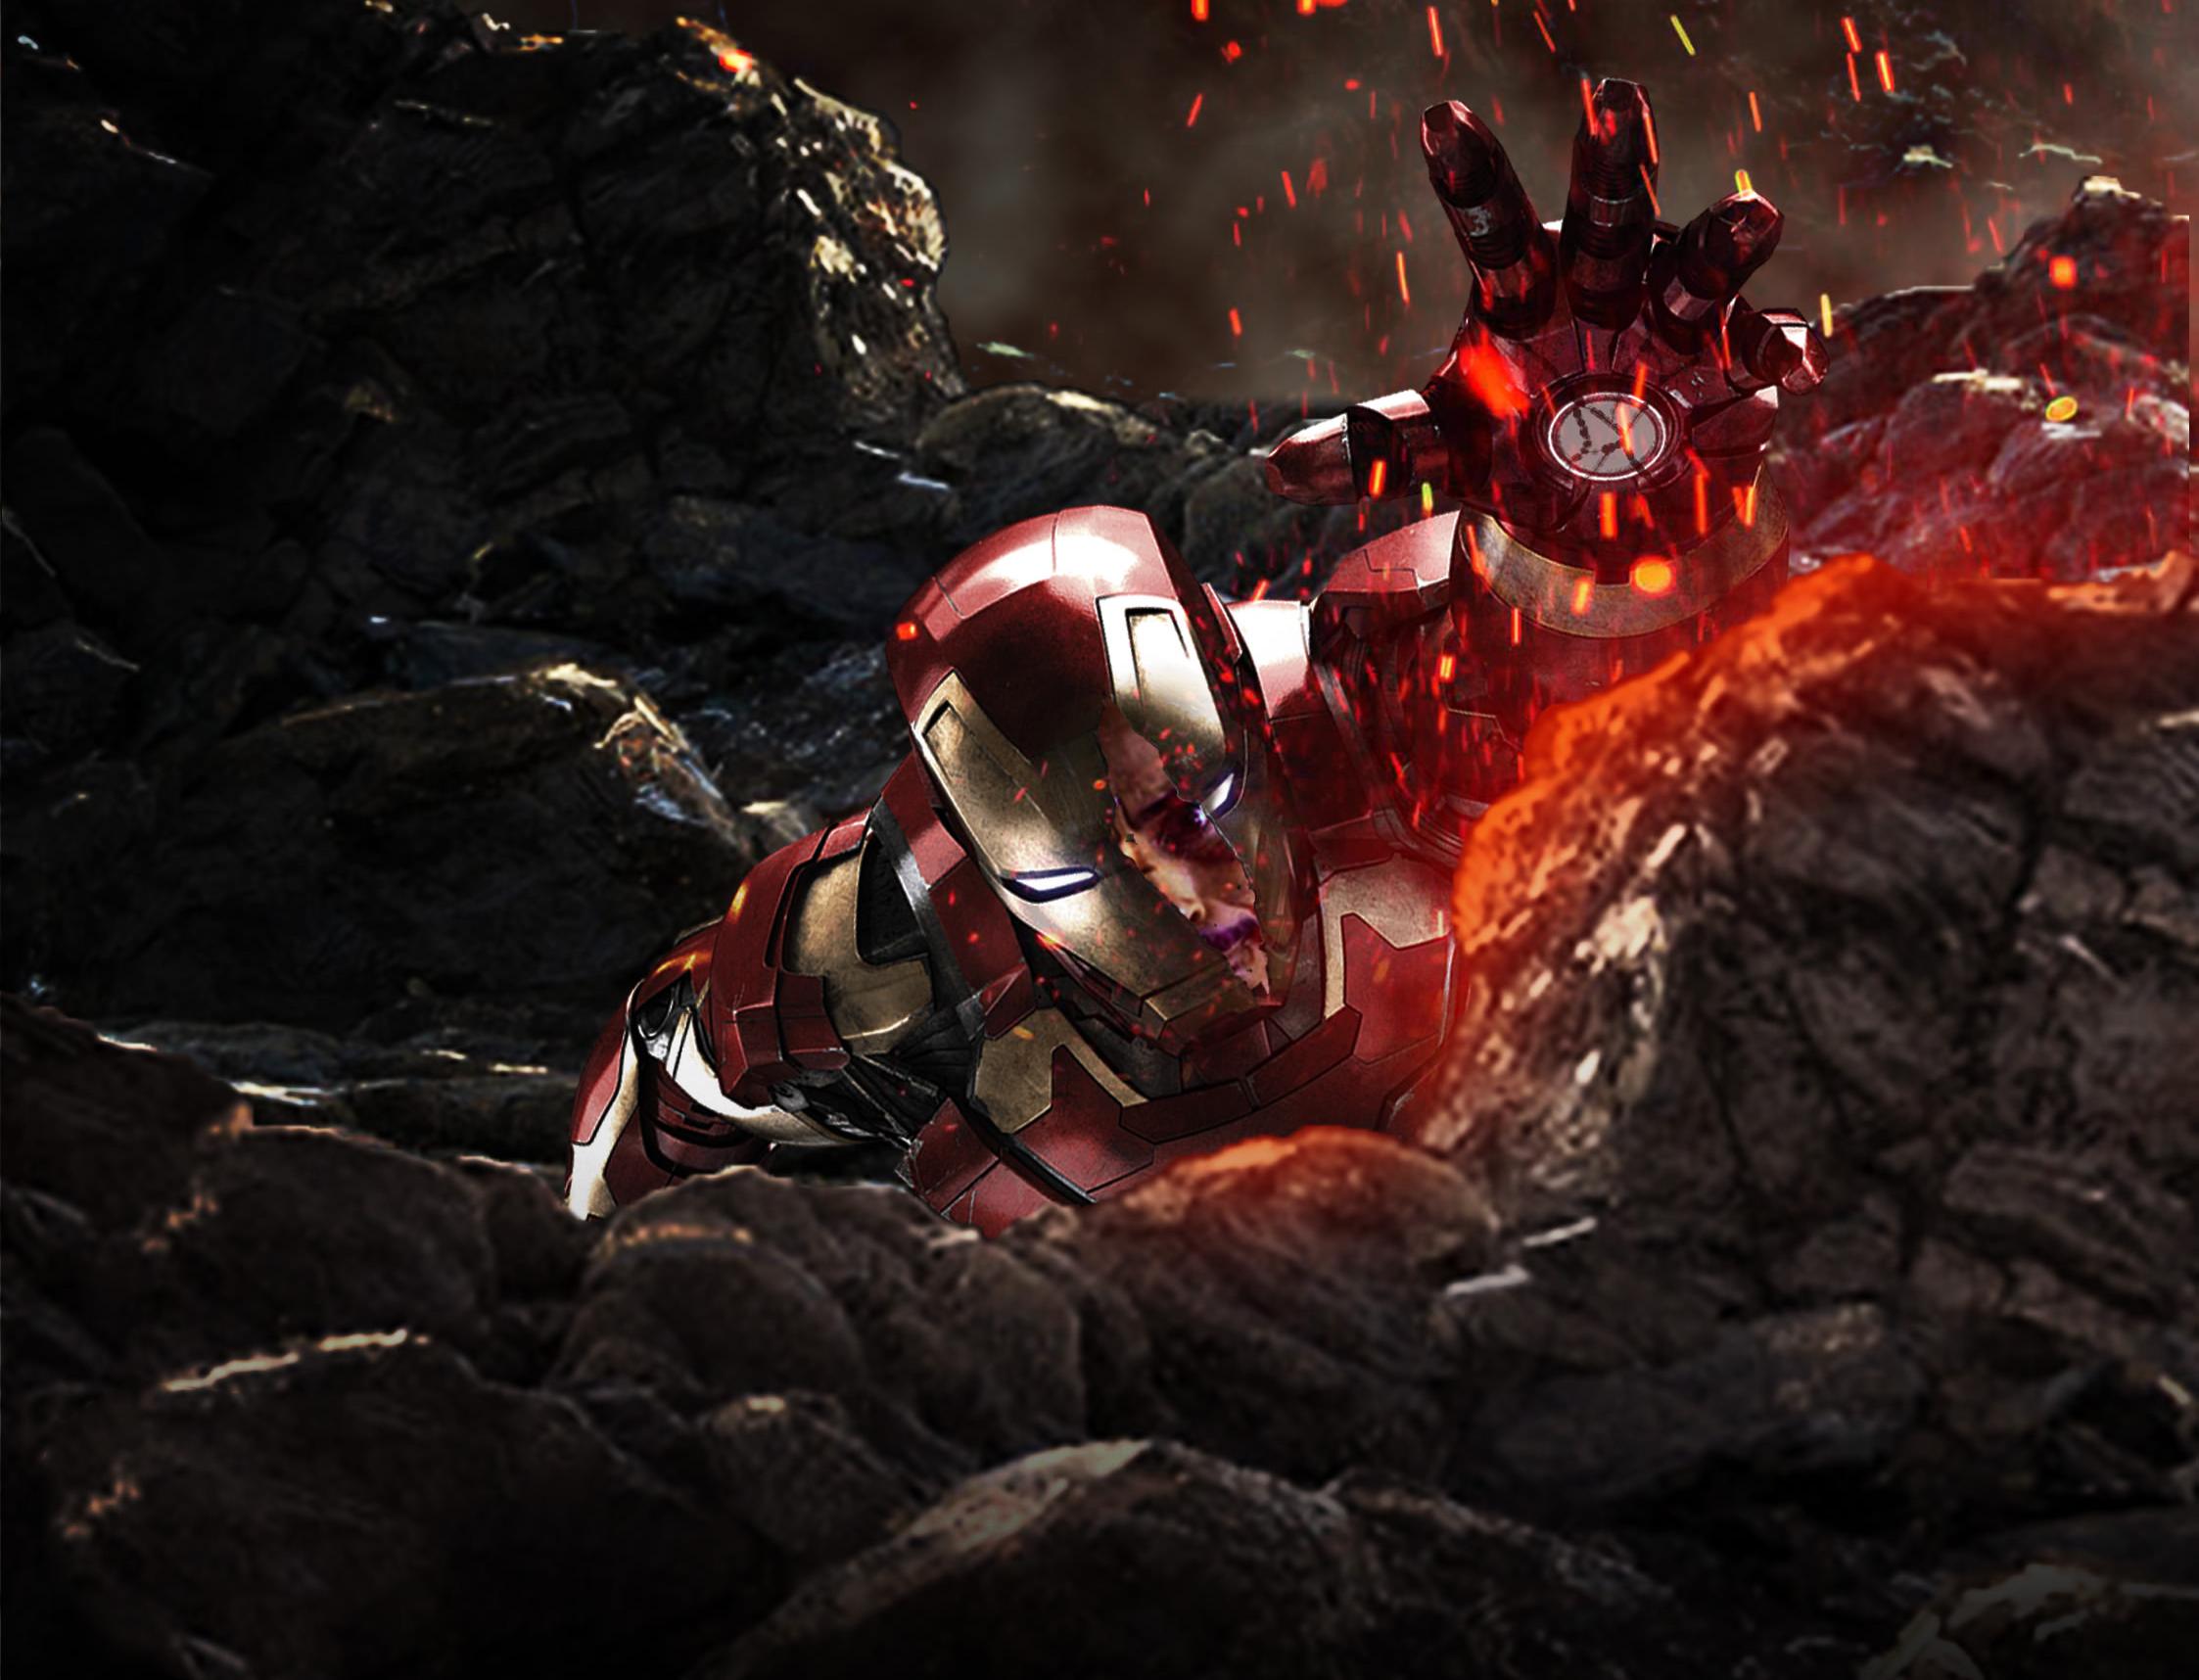 1920x1080 Iron Man In Avengers Infinity War Laptop Full Hd 1080p